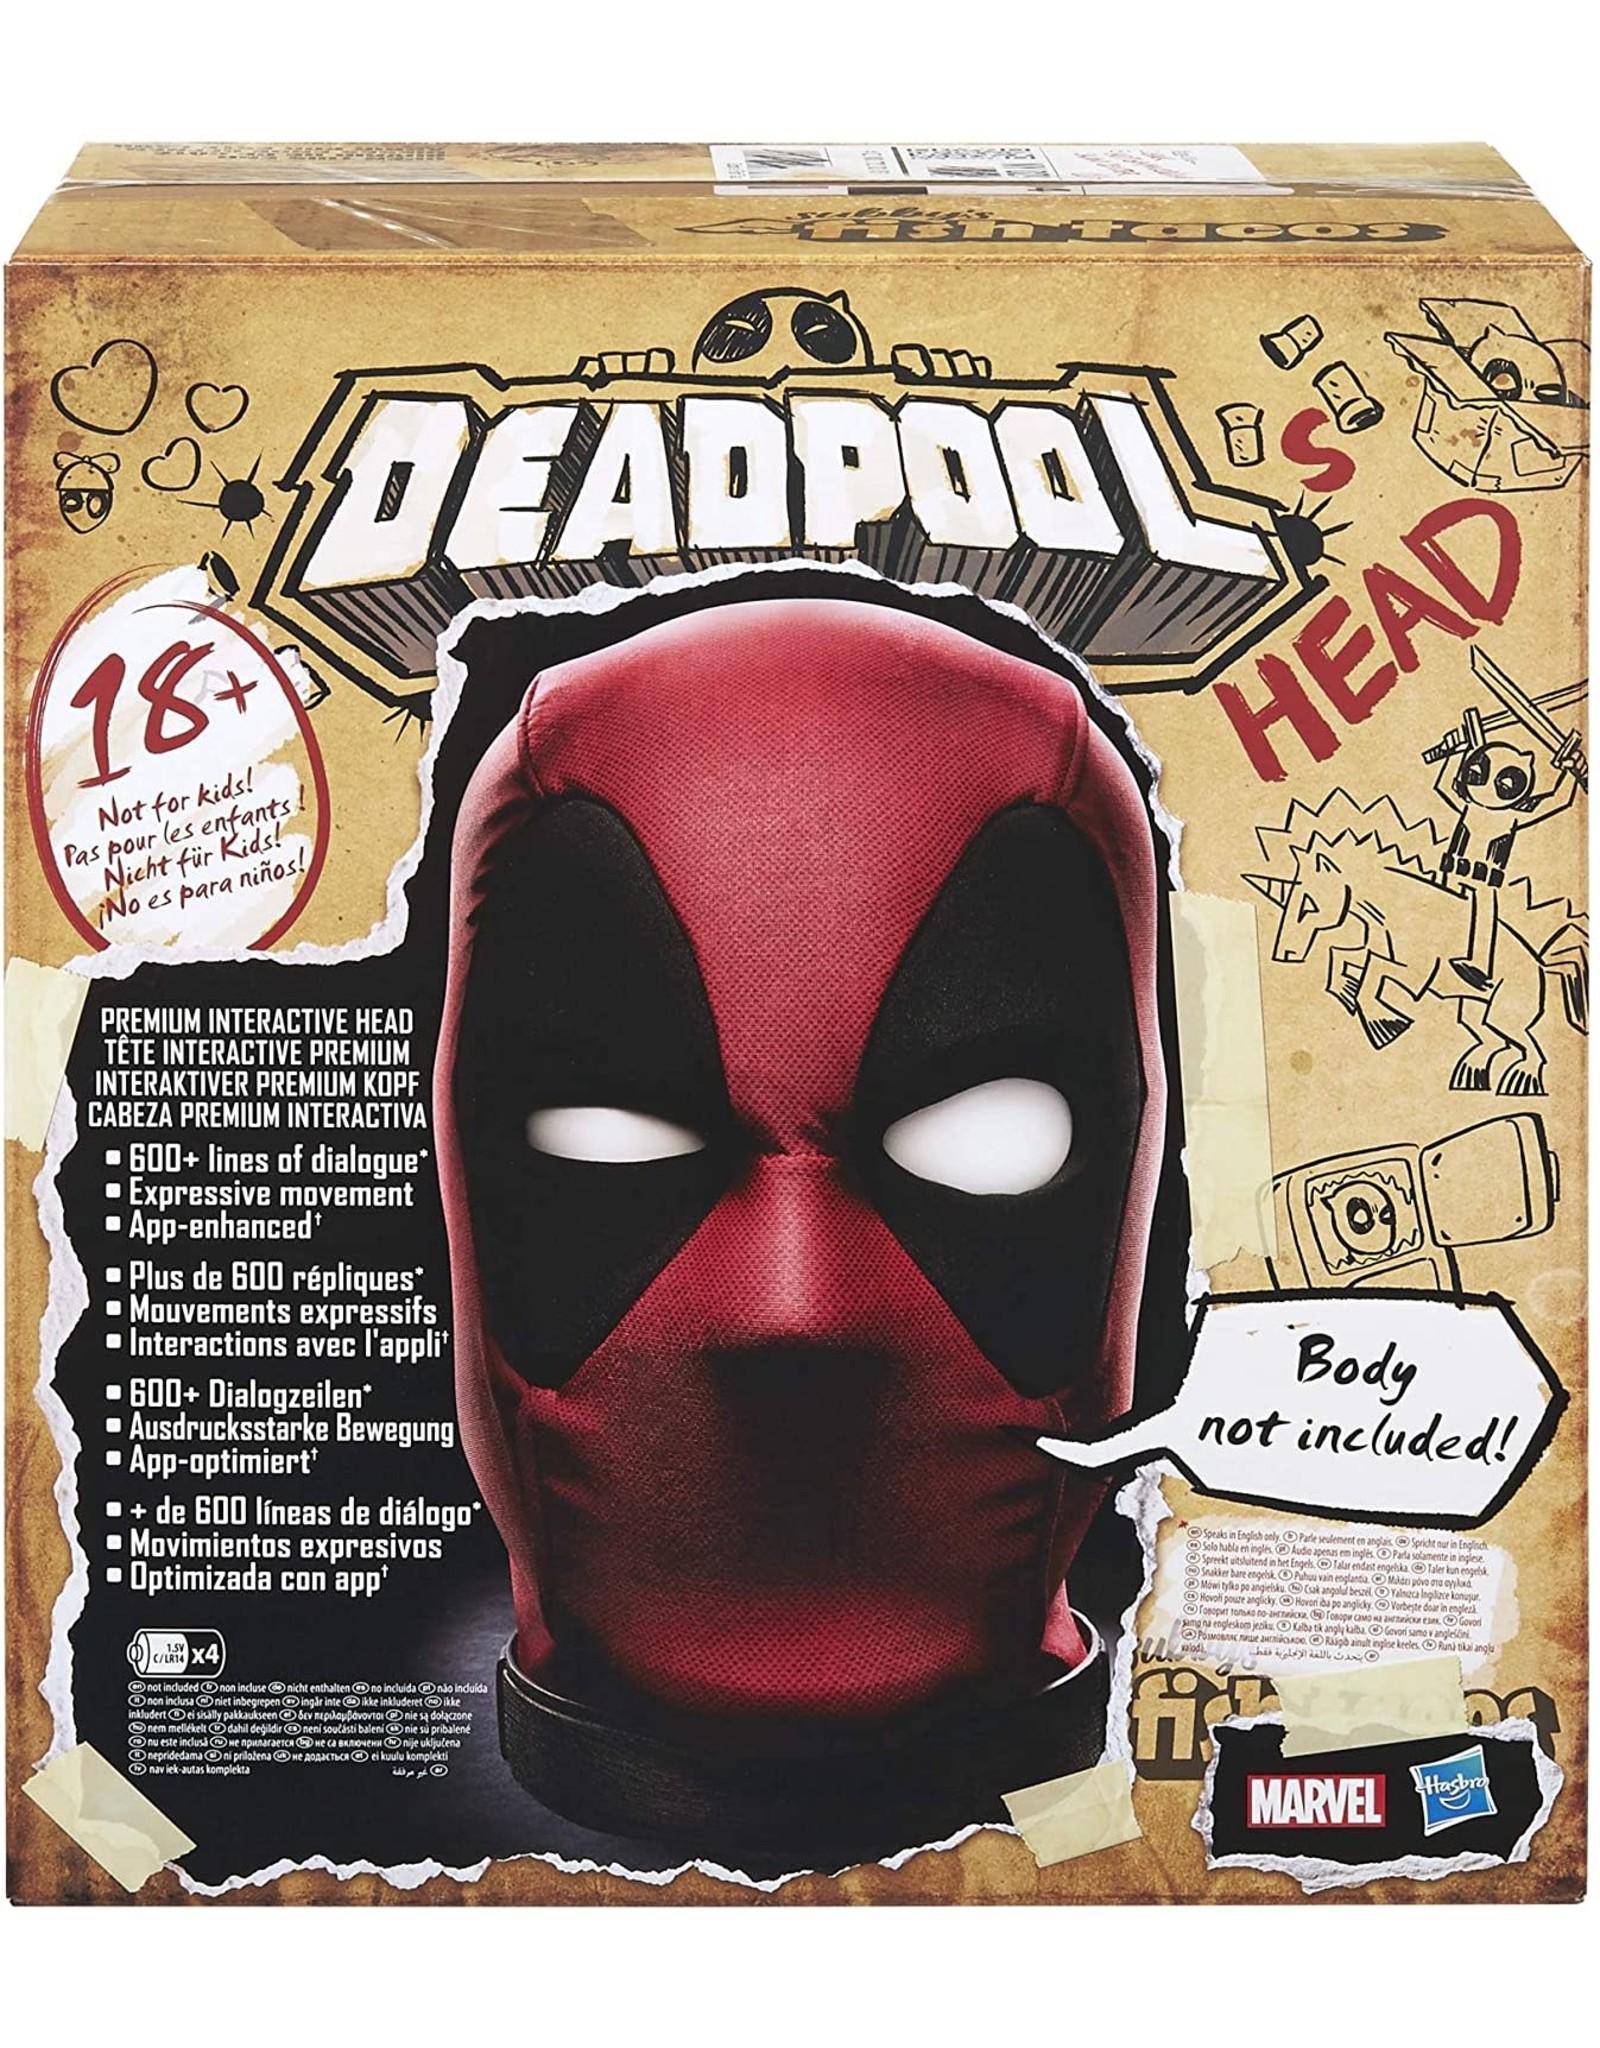 Hasbro DEADPOOL - Premium Interactive Head (UK)